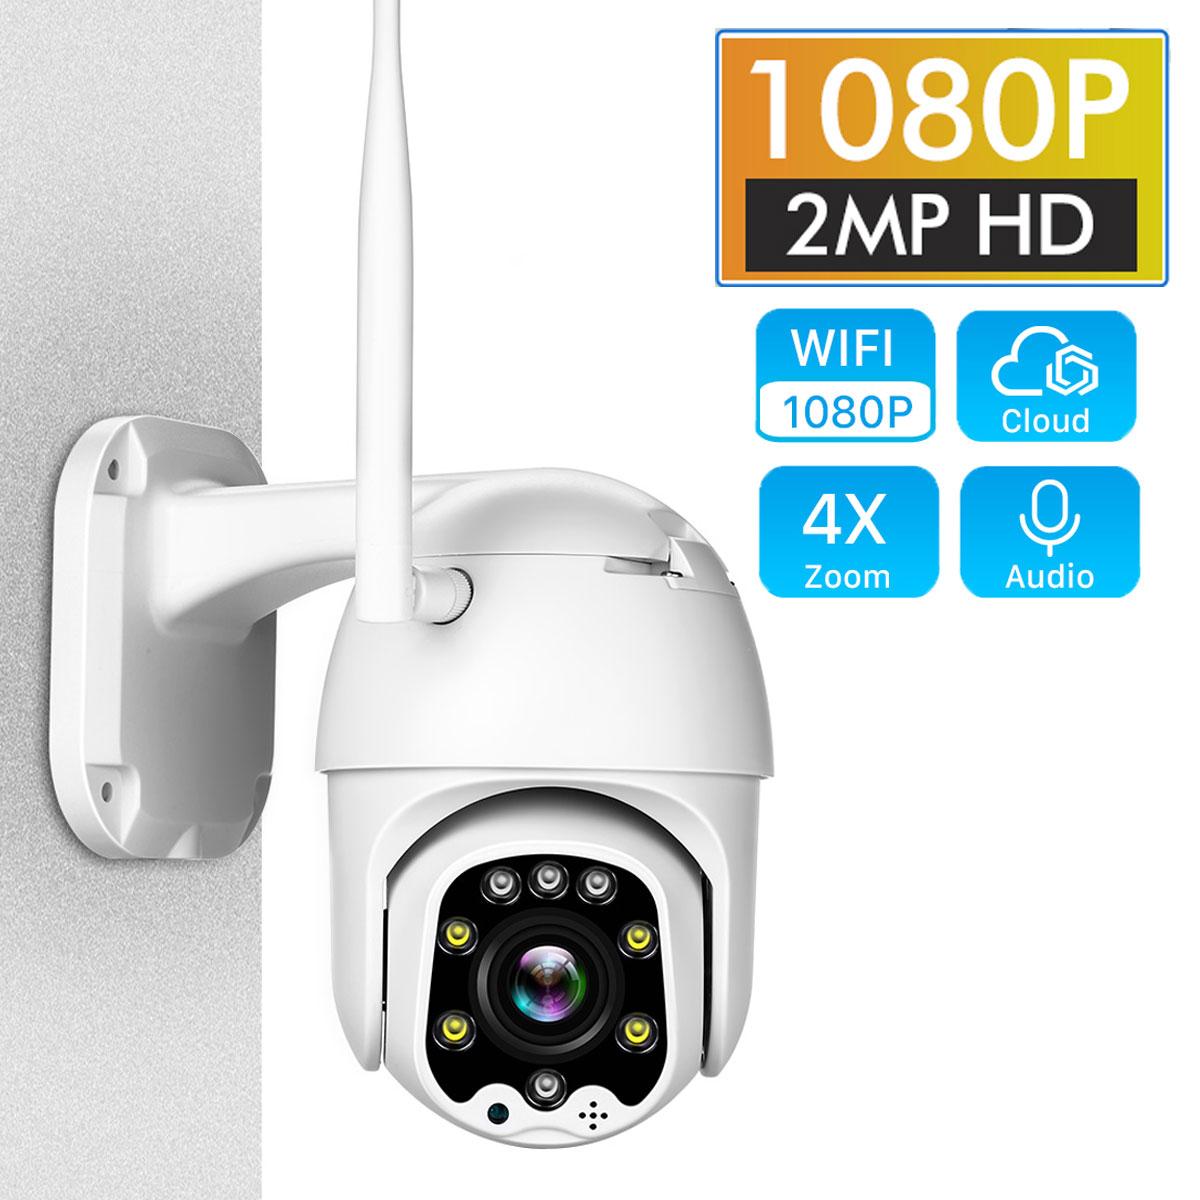 IP Camera WiFi 2MP 1080P Wireless PTZ Speed Dome CCTV Onvif Camera Outdoor IP66 Security Surveillance Camara Vigilancia Exterior